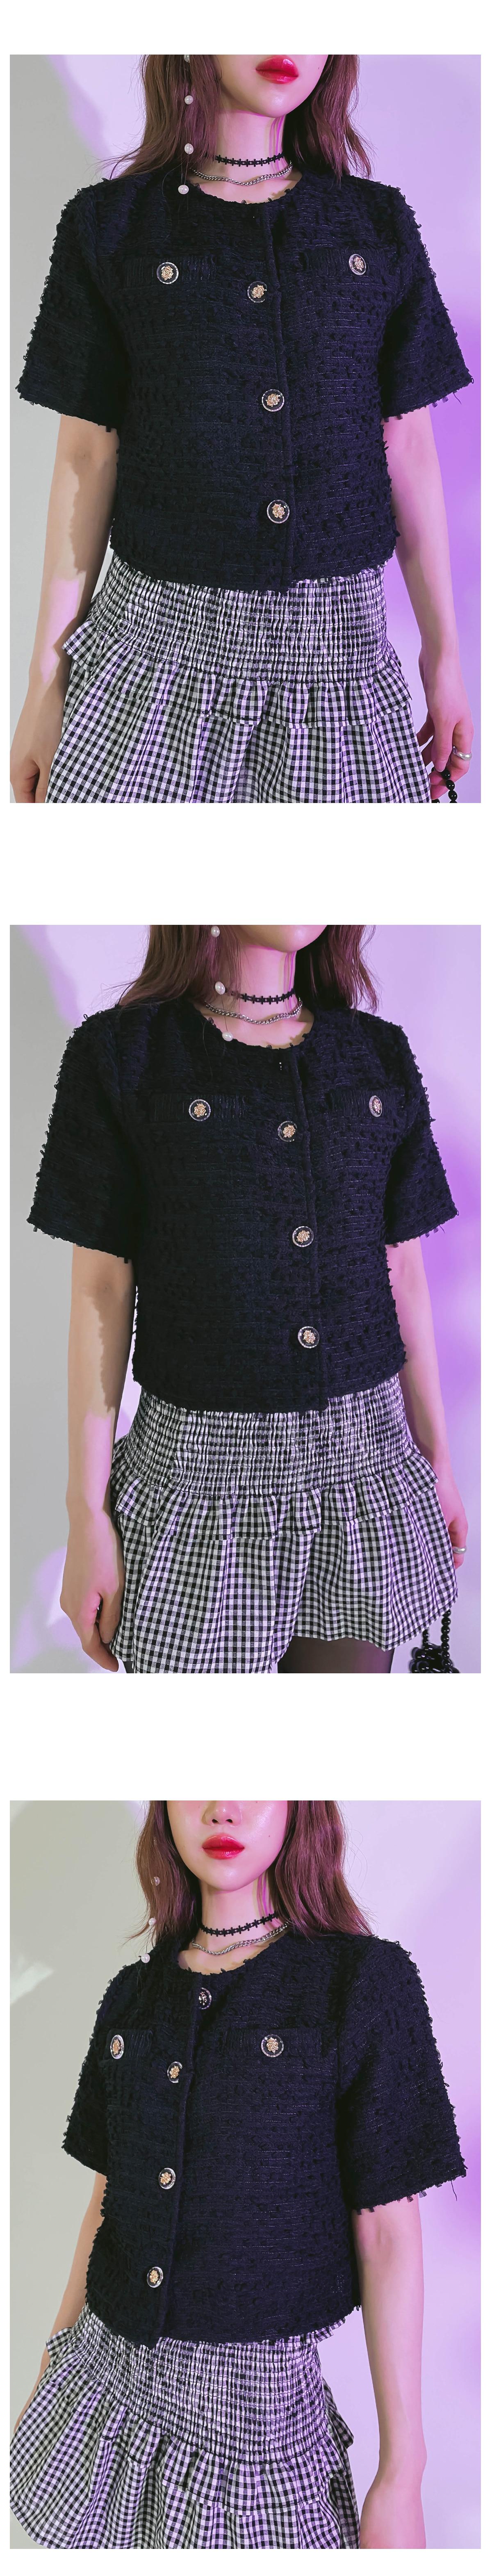 Lovely tweed jacket